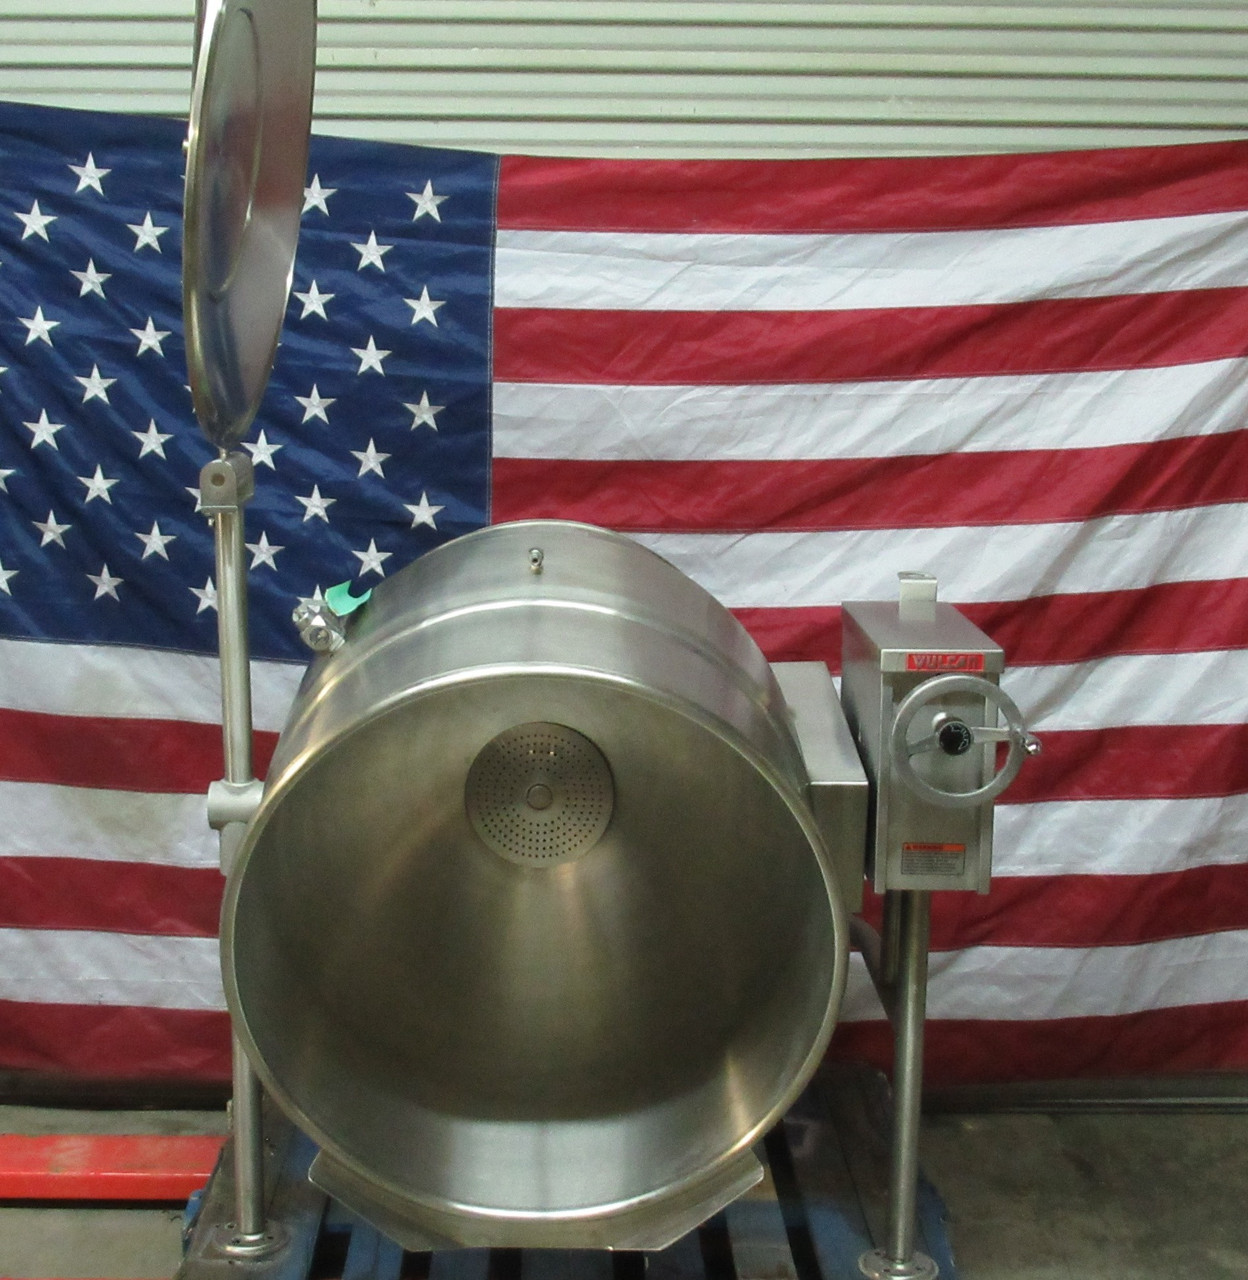 Vulcan VELT-60 208-220V Single Phase 60 Gal Electric Tilting Steam Jacketed Kettle